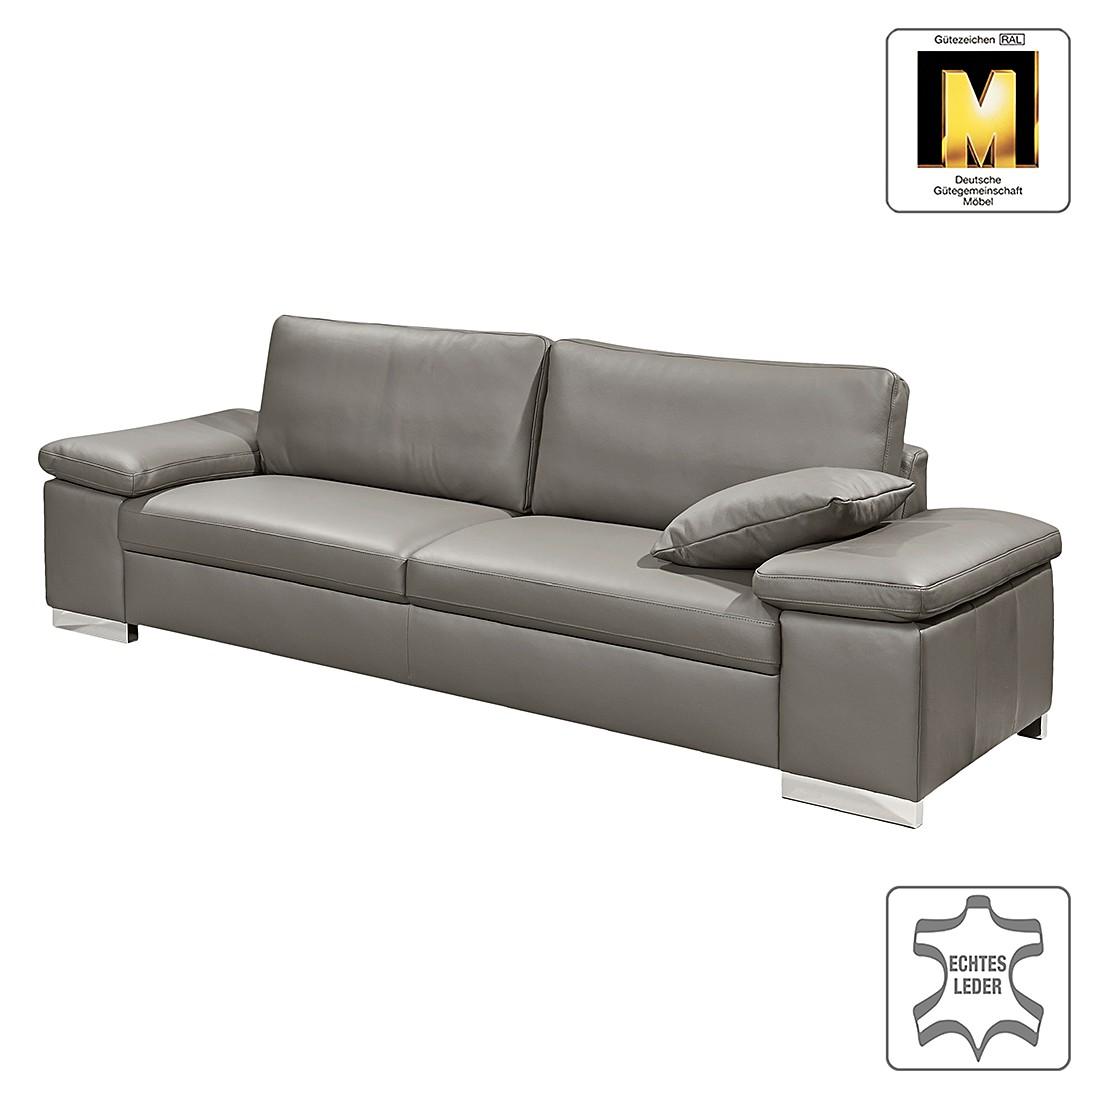 Sofa Casual Line V (3-Sitzer) – Echtleder – Grau – Gedecktes Dickleder, Claas Claasen online bestellen